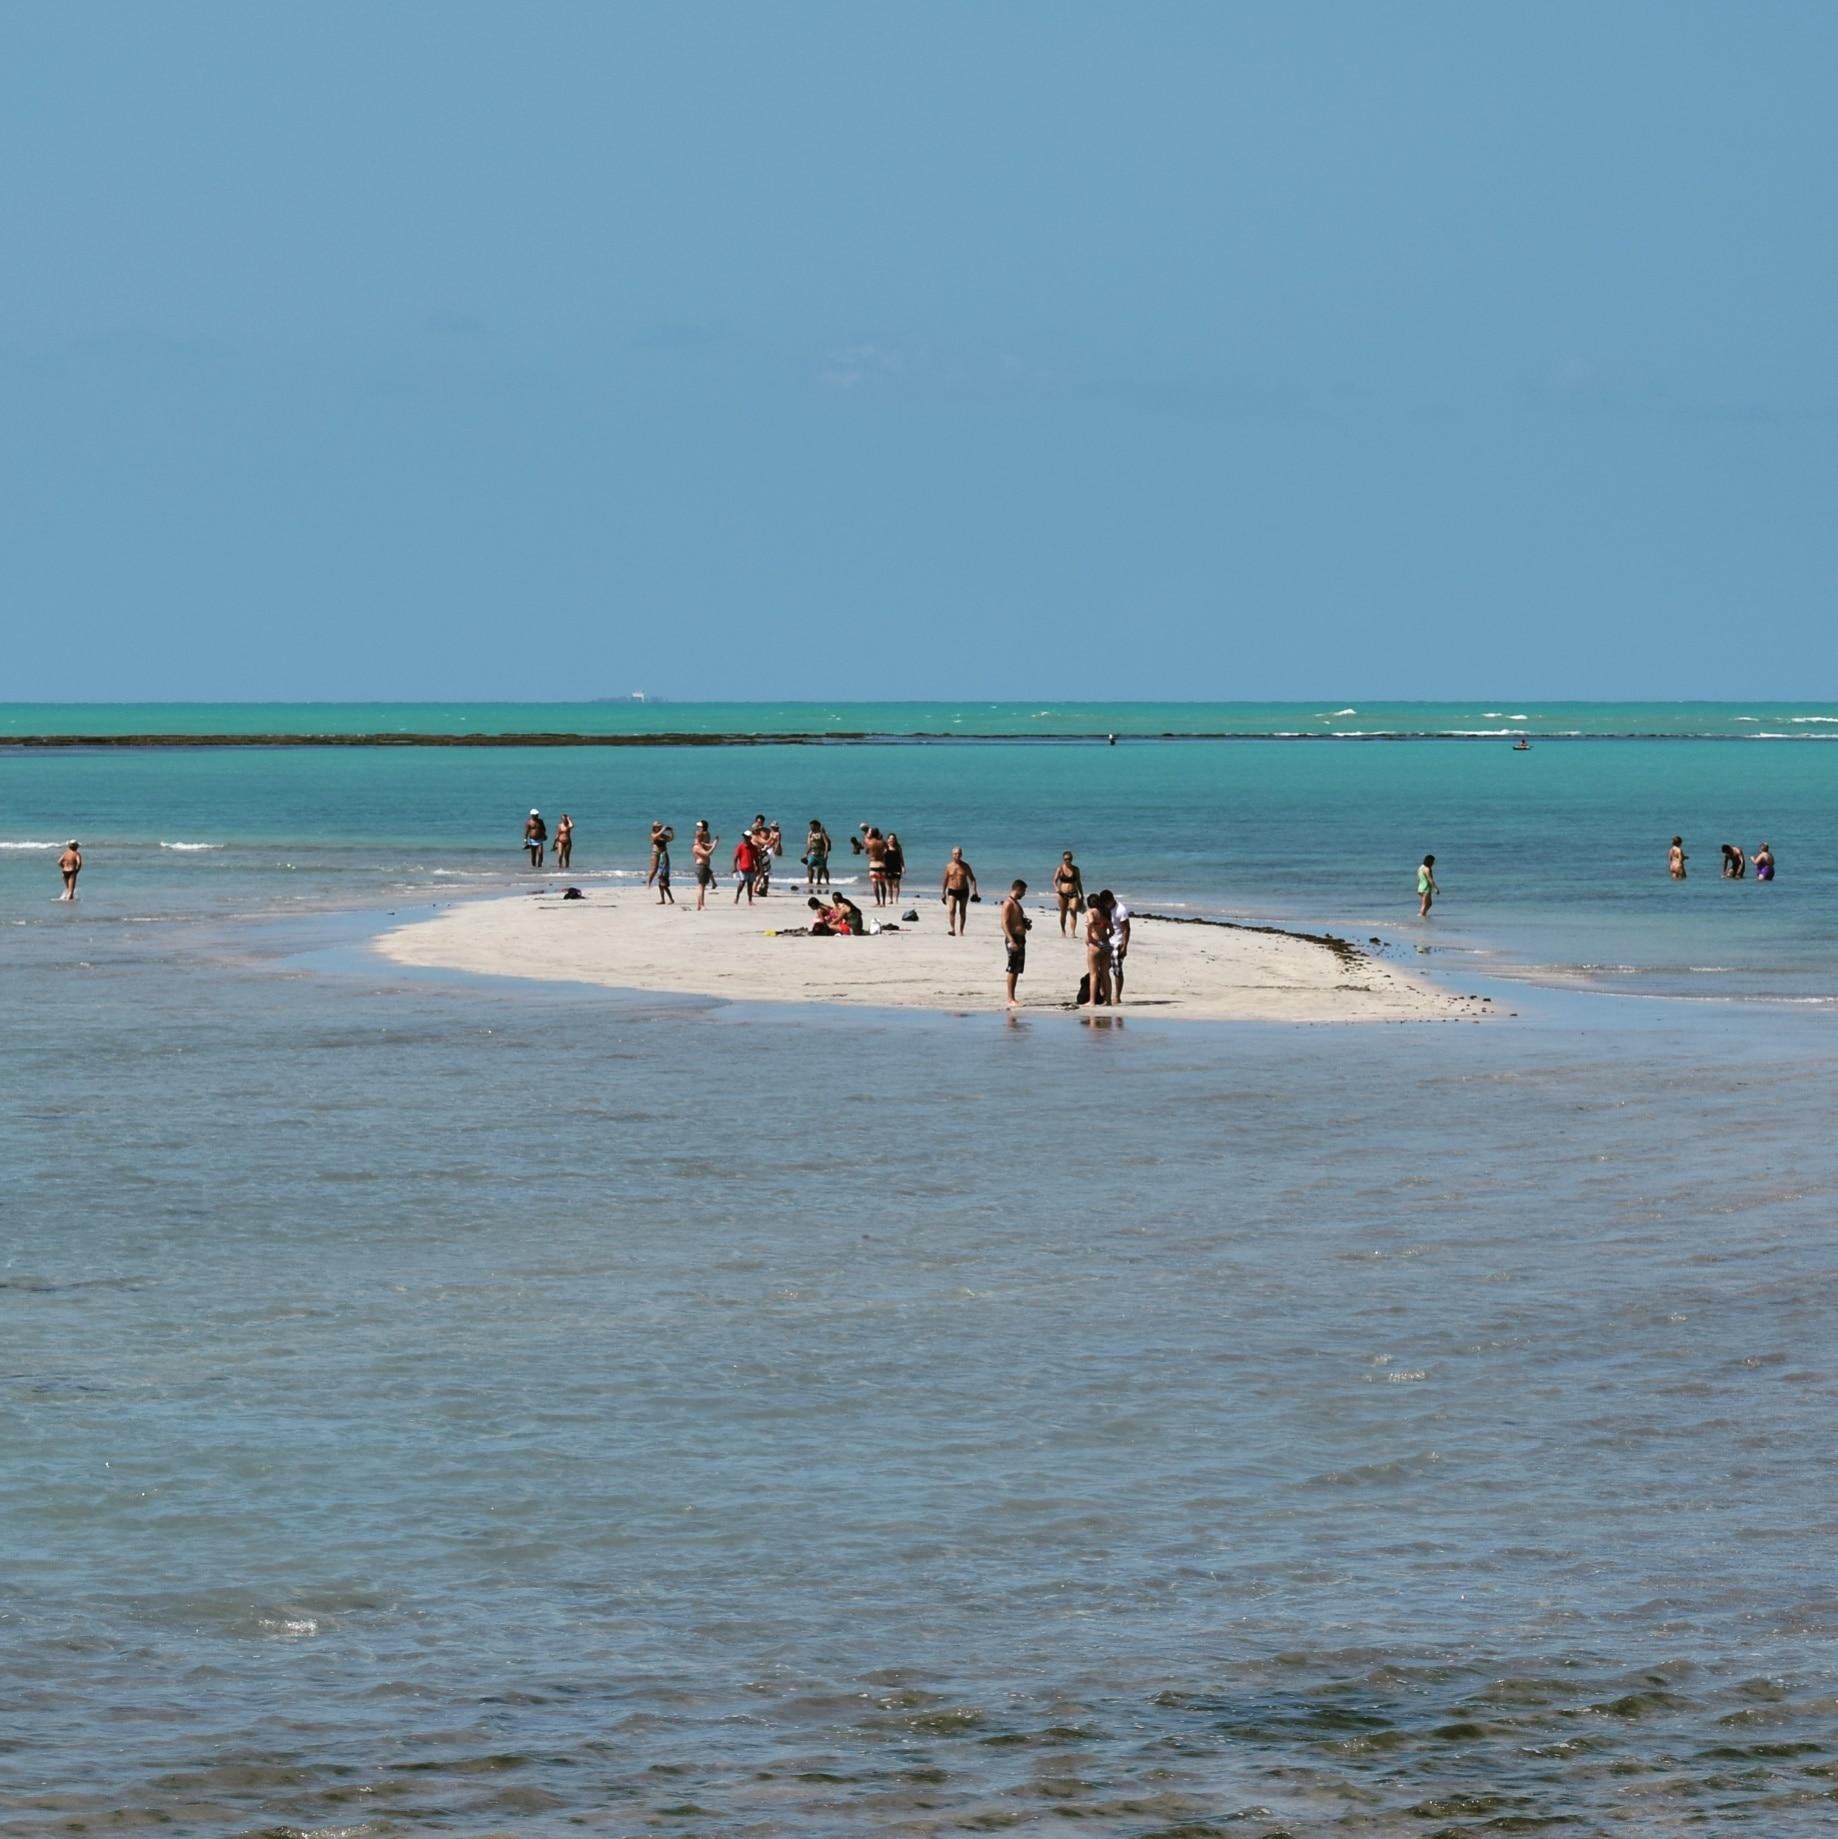 Jatiuca, Maceio, Alagoas (staat), Brazilië